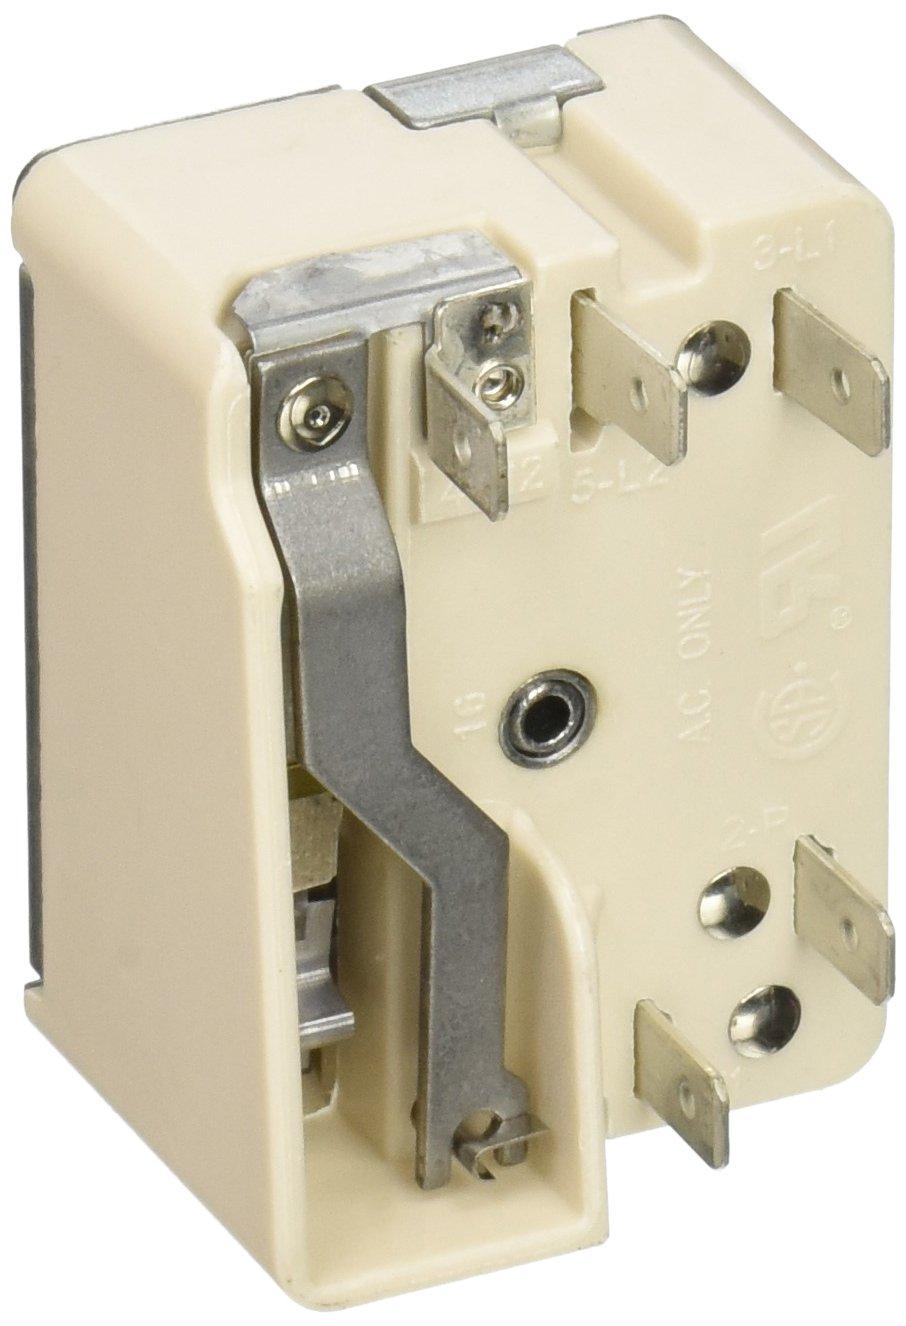 Frigidaire 318293830 Range/Stove/Oven Surface Element Switch